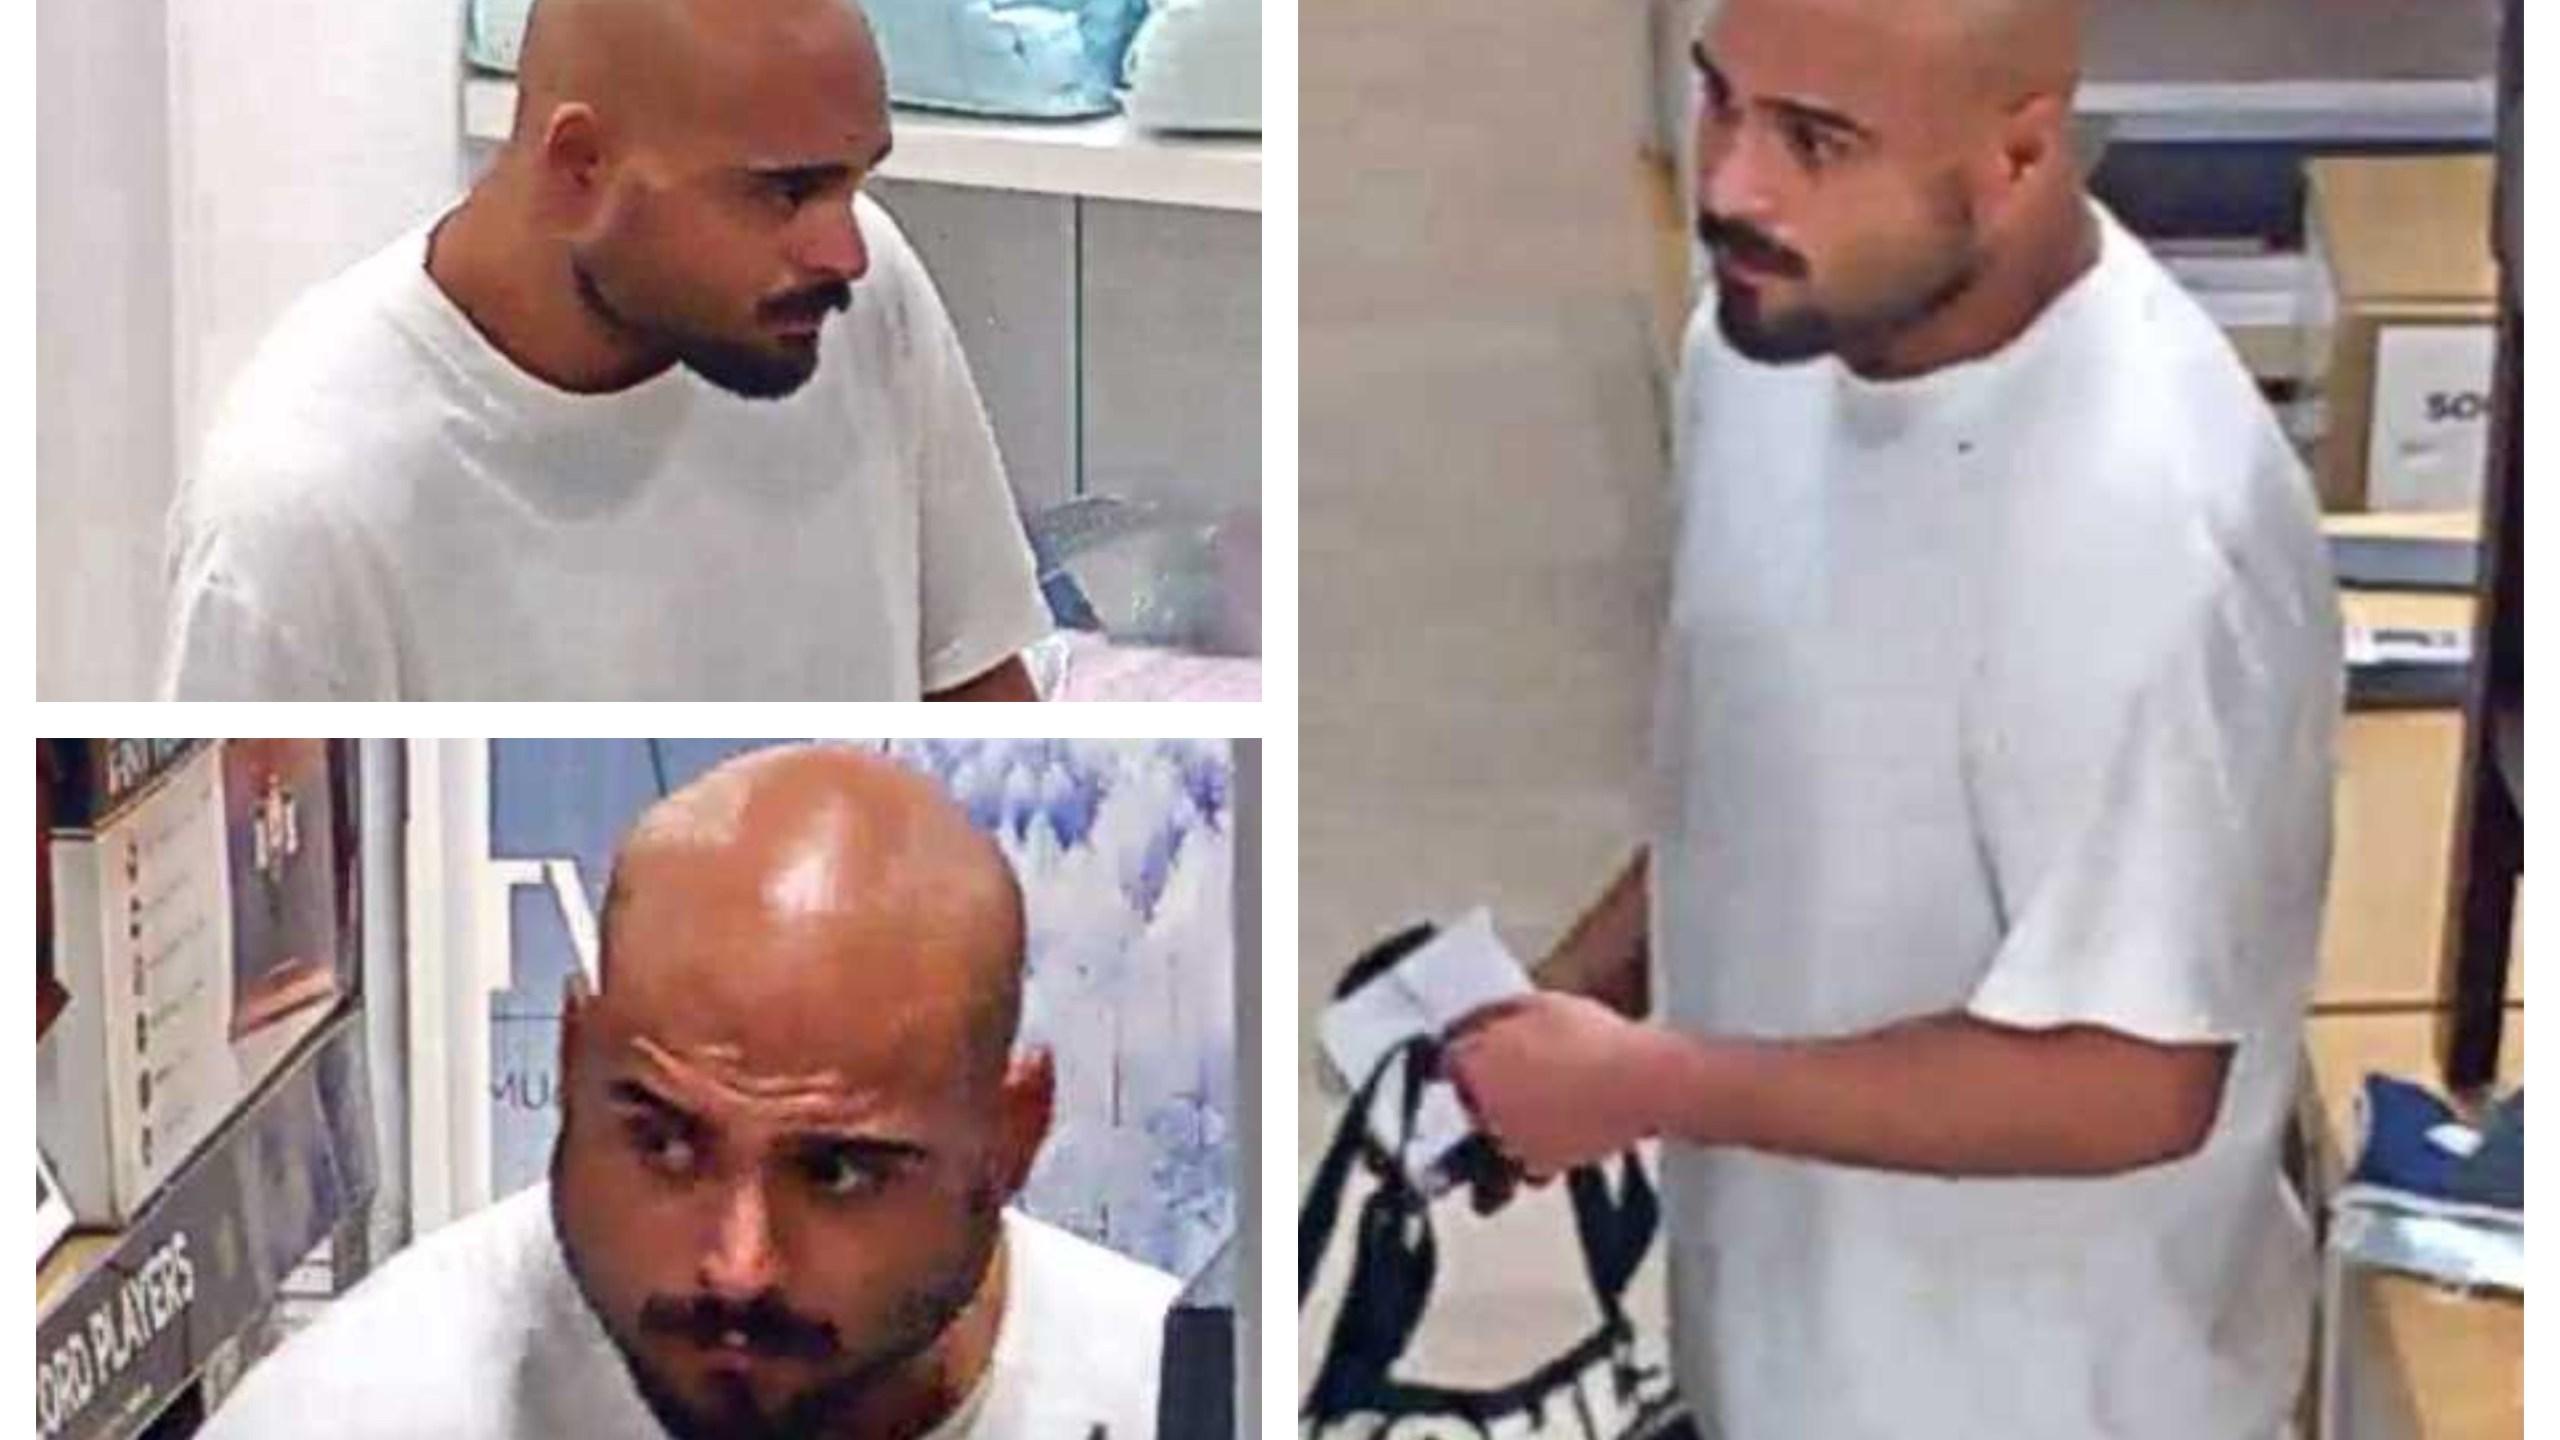 Bakersfield Police Dept kohls suspect_1538679531219.jpg.jpg